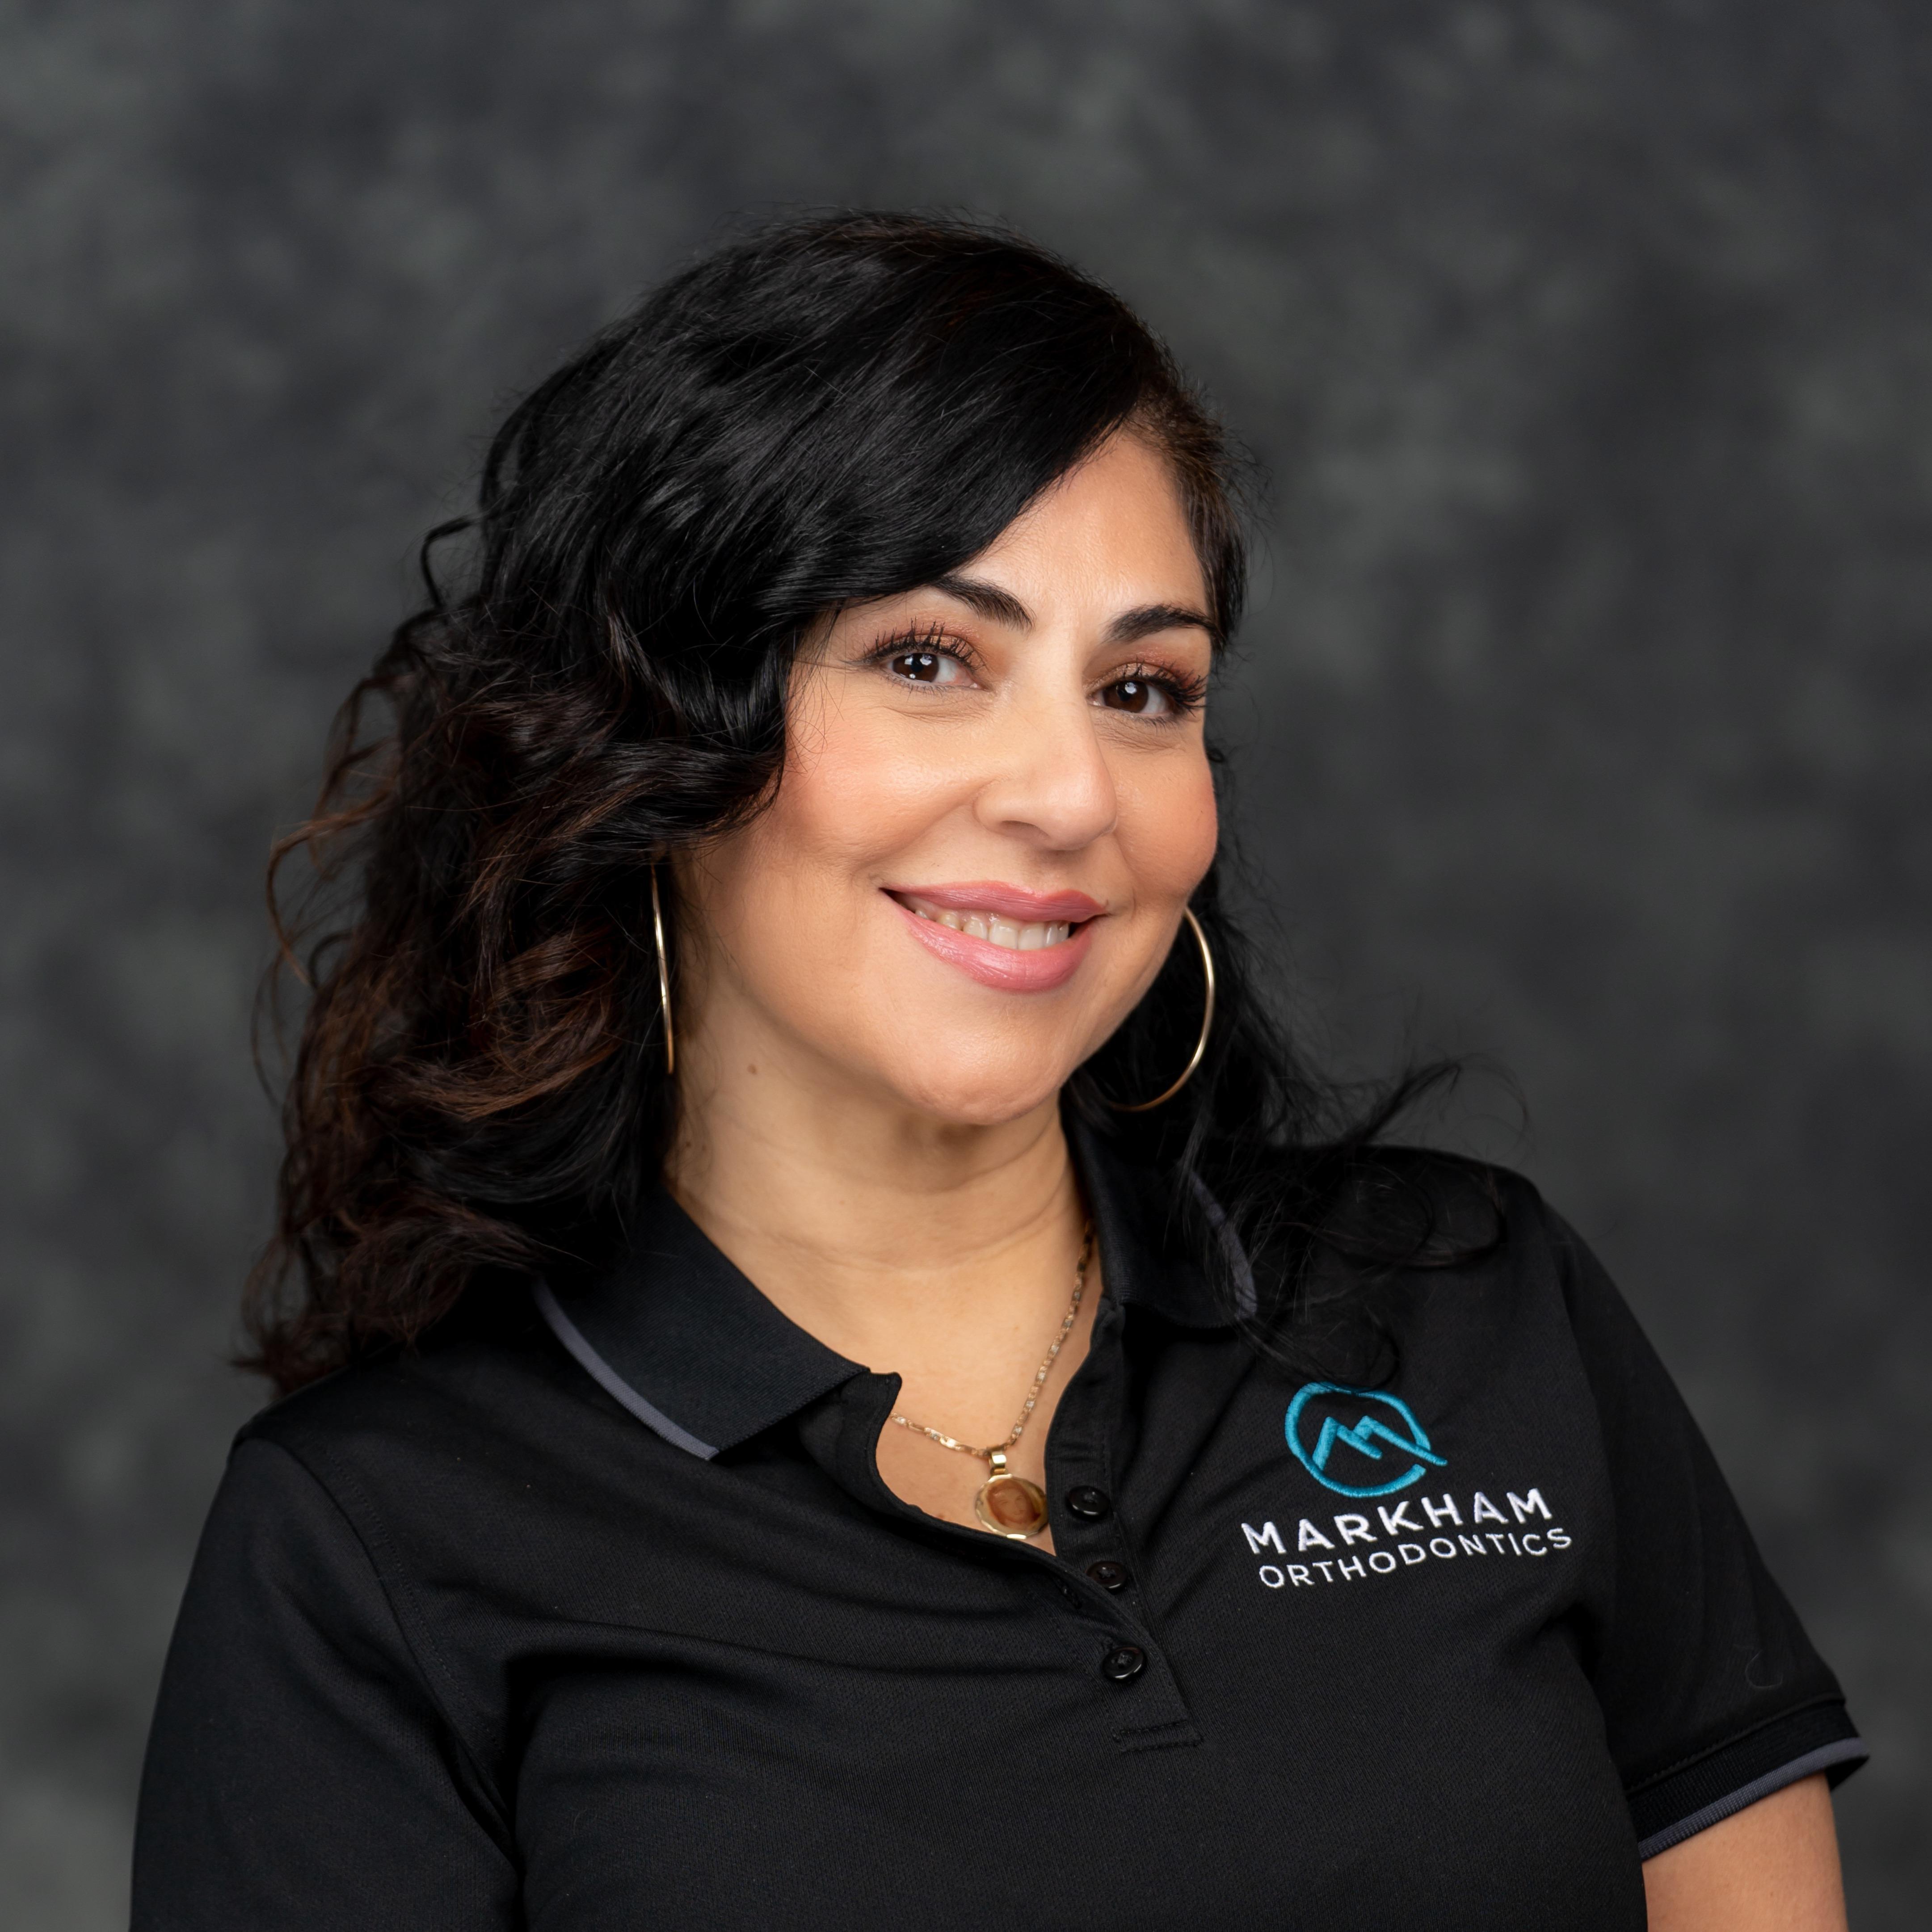 Brenda Colosio of Markham Orthodontics